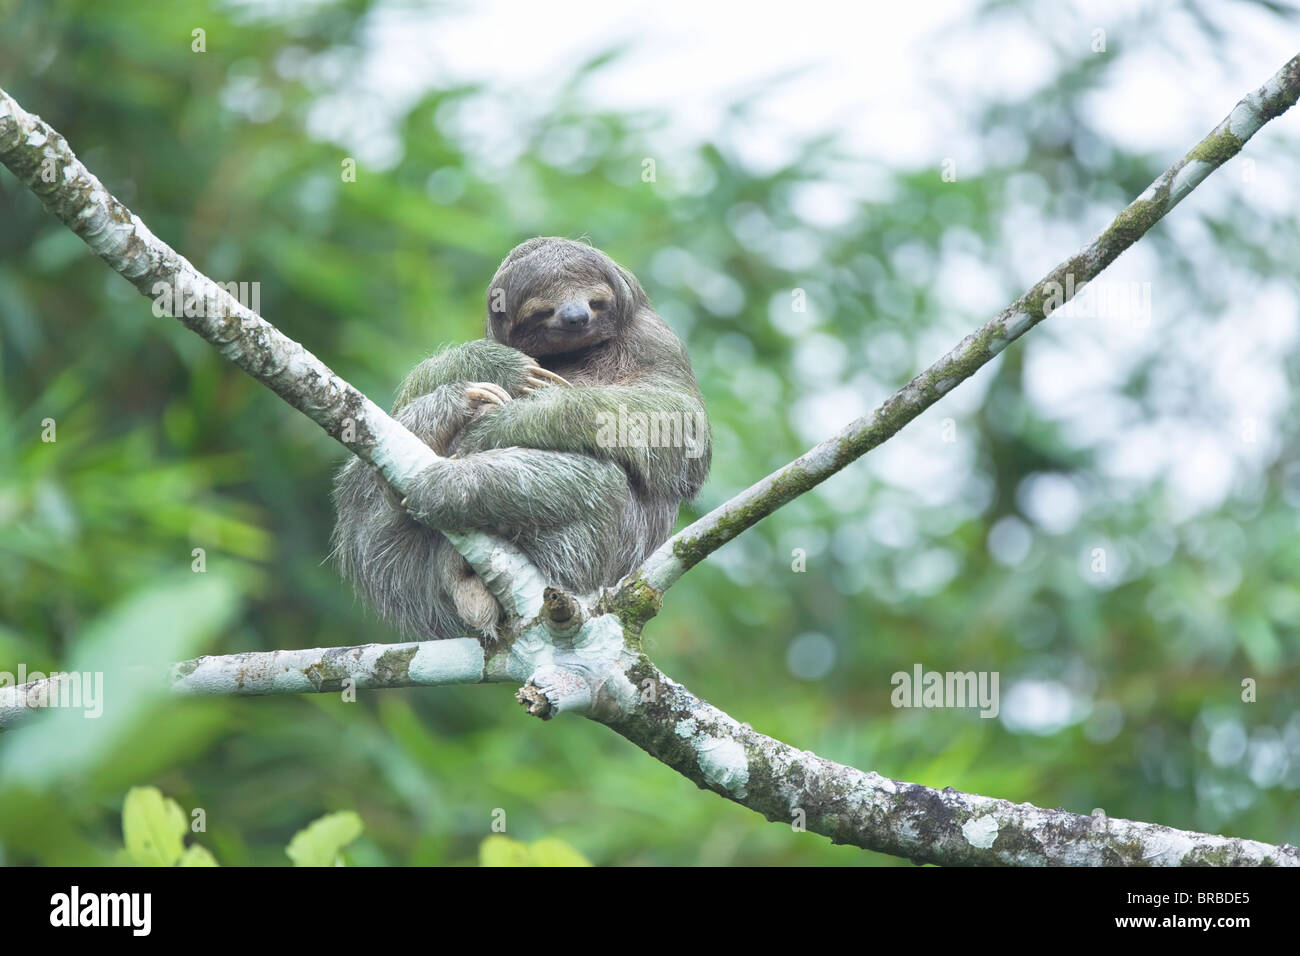 Three-toed sloth (Bradypus variegatus) sitting on a tree, Arenal, La Fortuna, Costa Rica, Central America Stock Photo